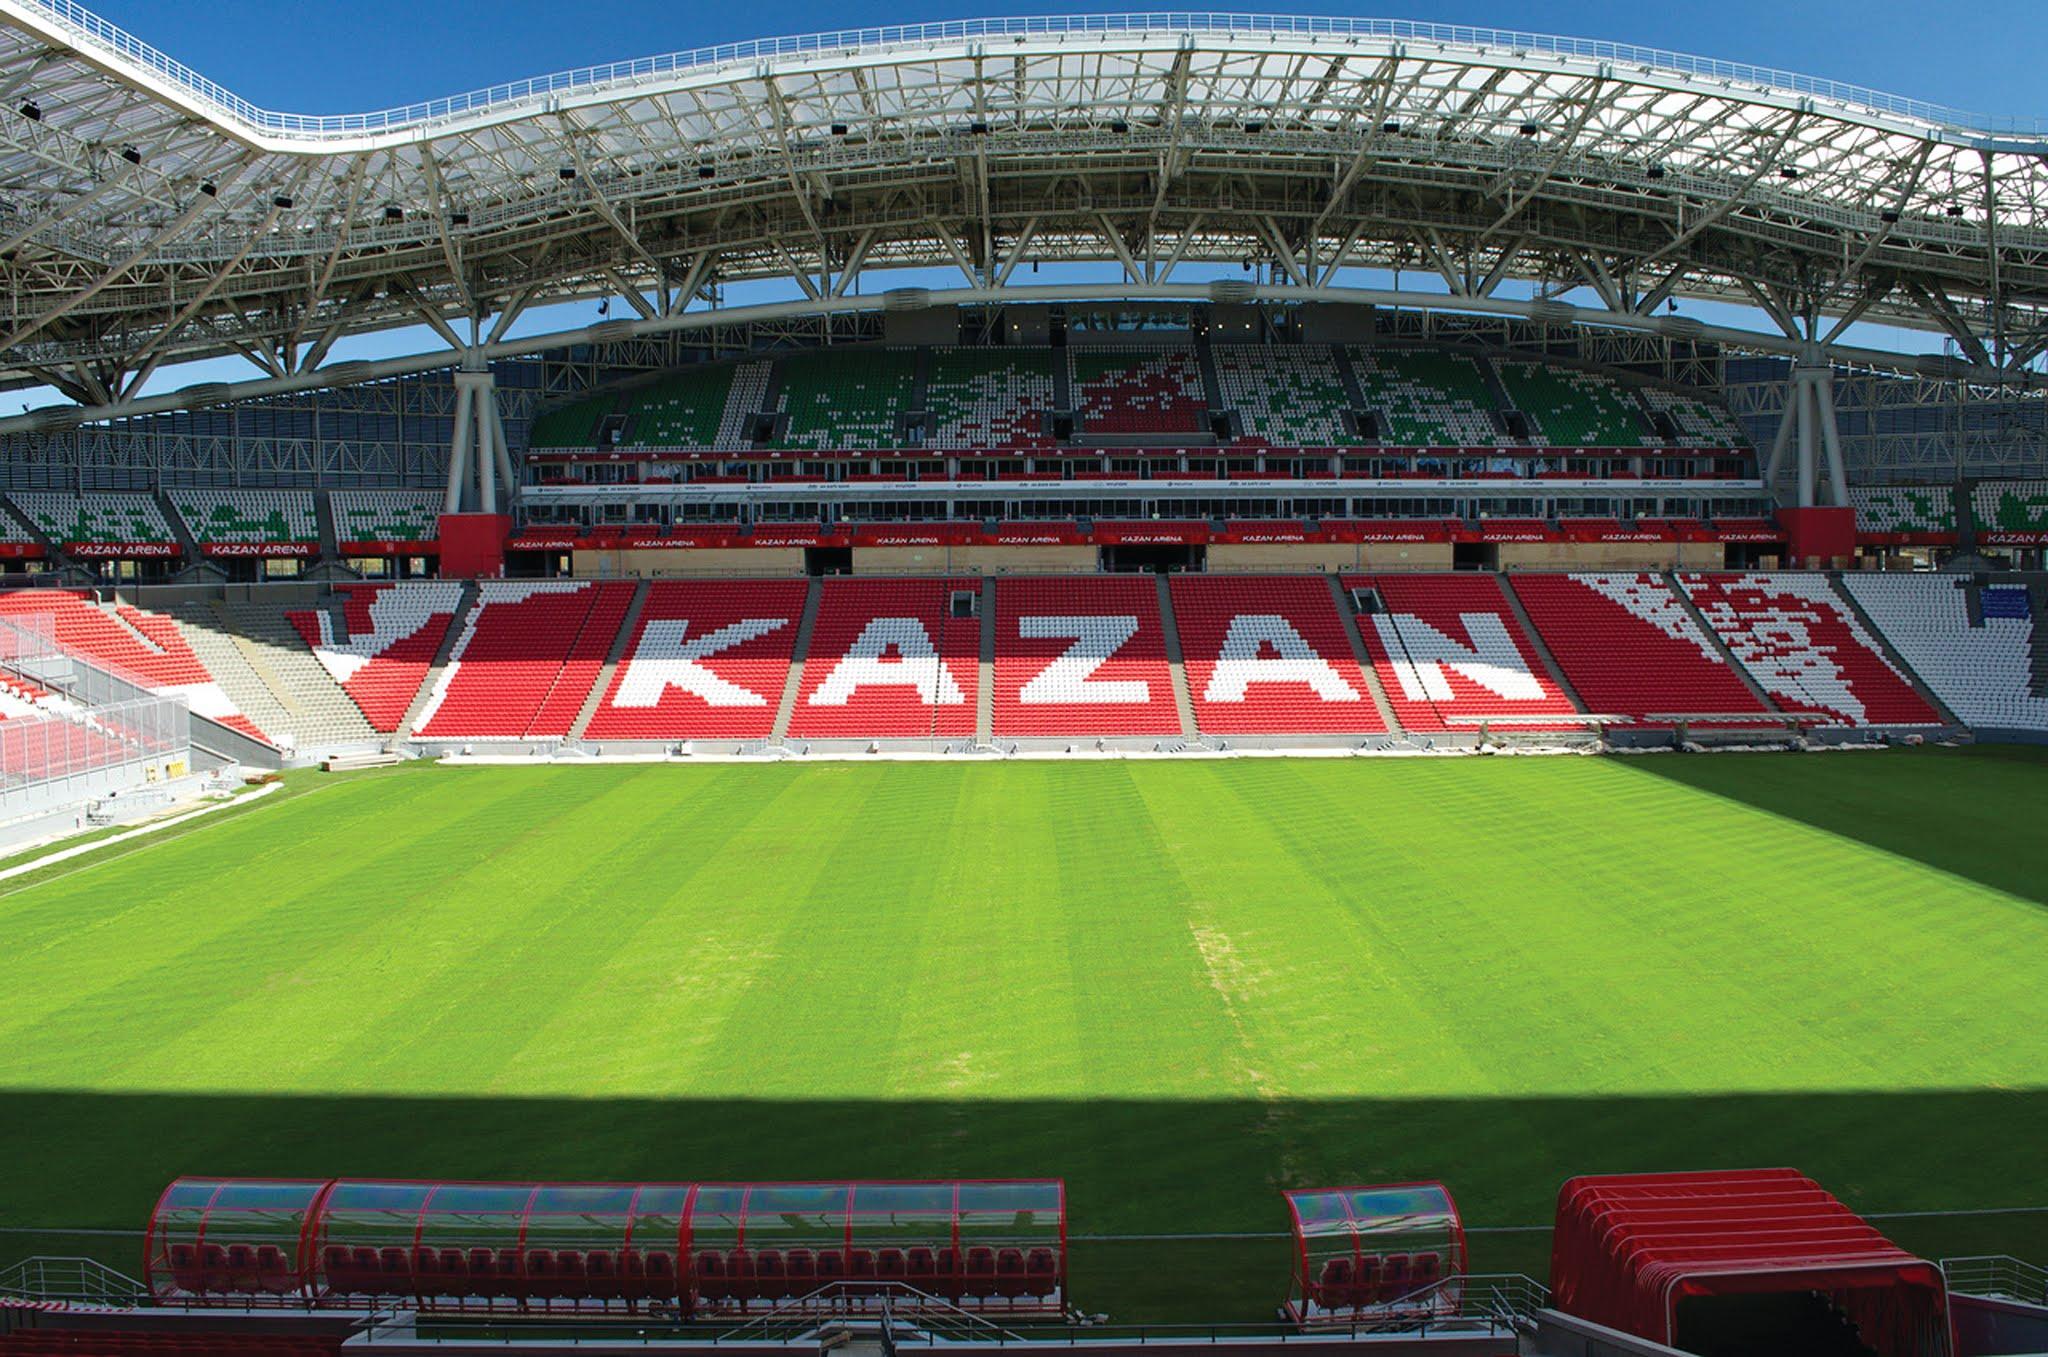 Стадион «Казань Арена» г. Казань, Россия